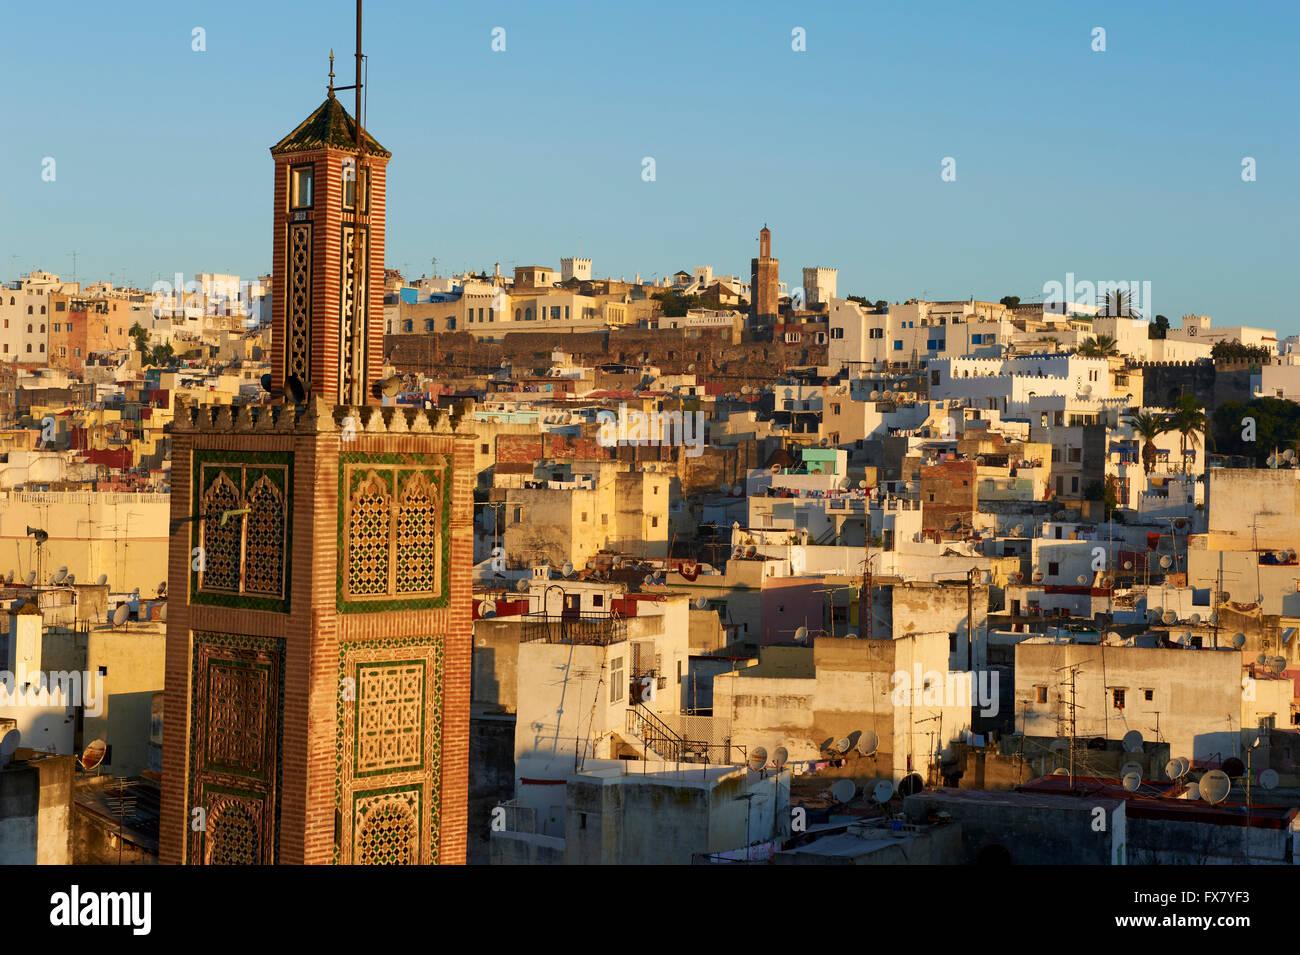 Morocco, Tangier, Medina, old city - Stock Image